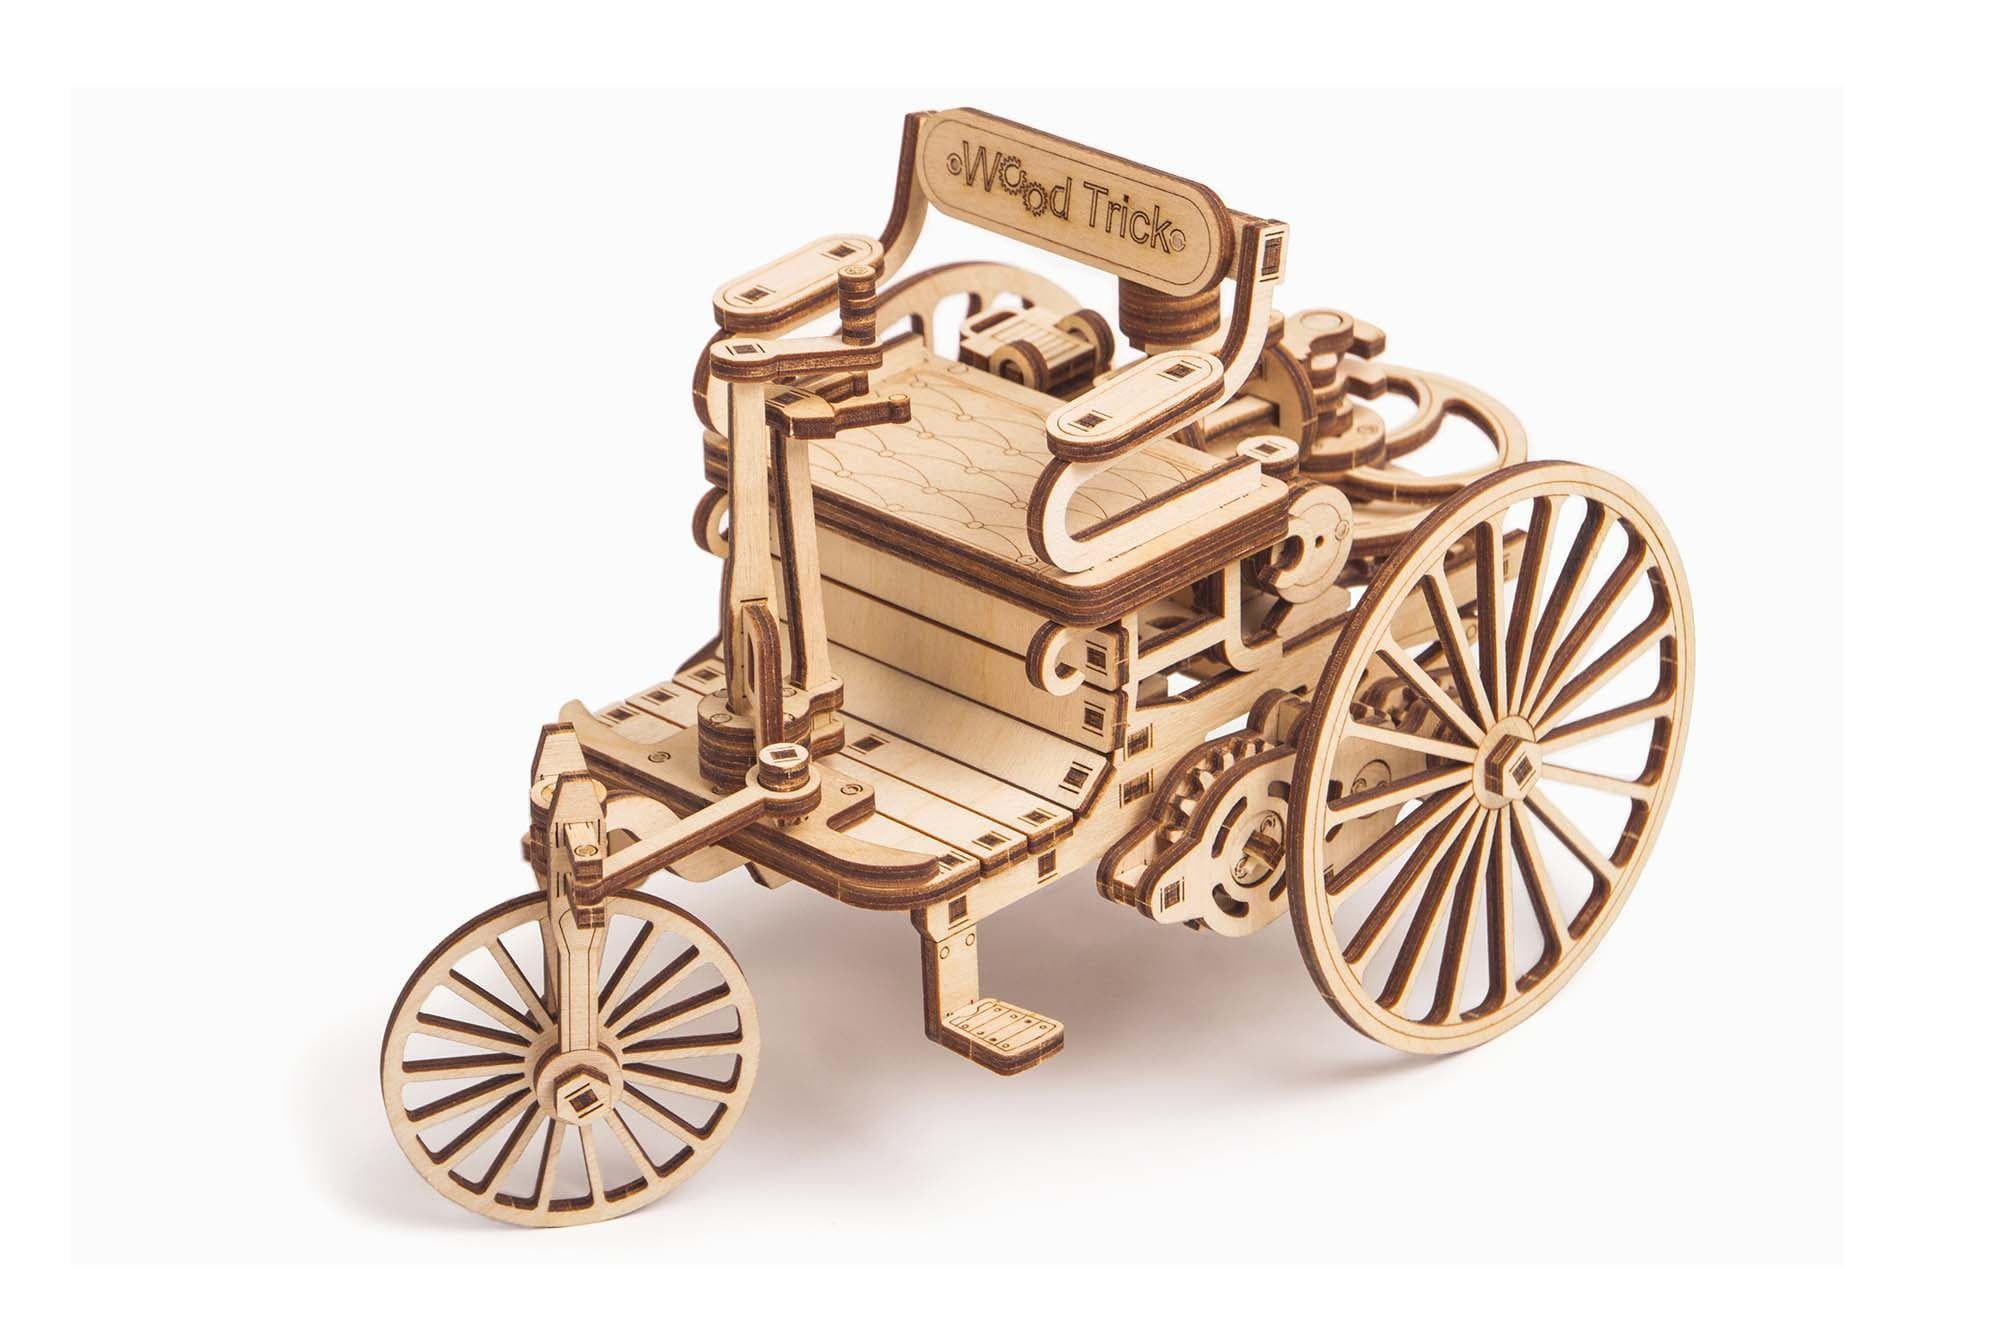 Wood Trick First Car